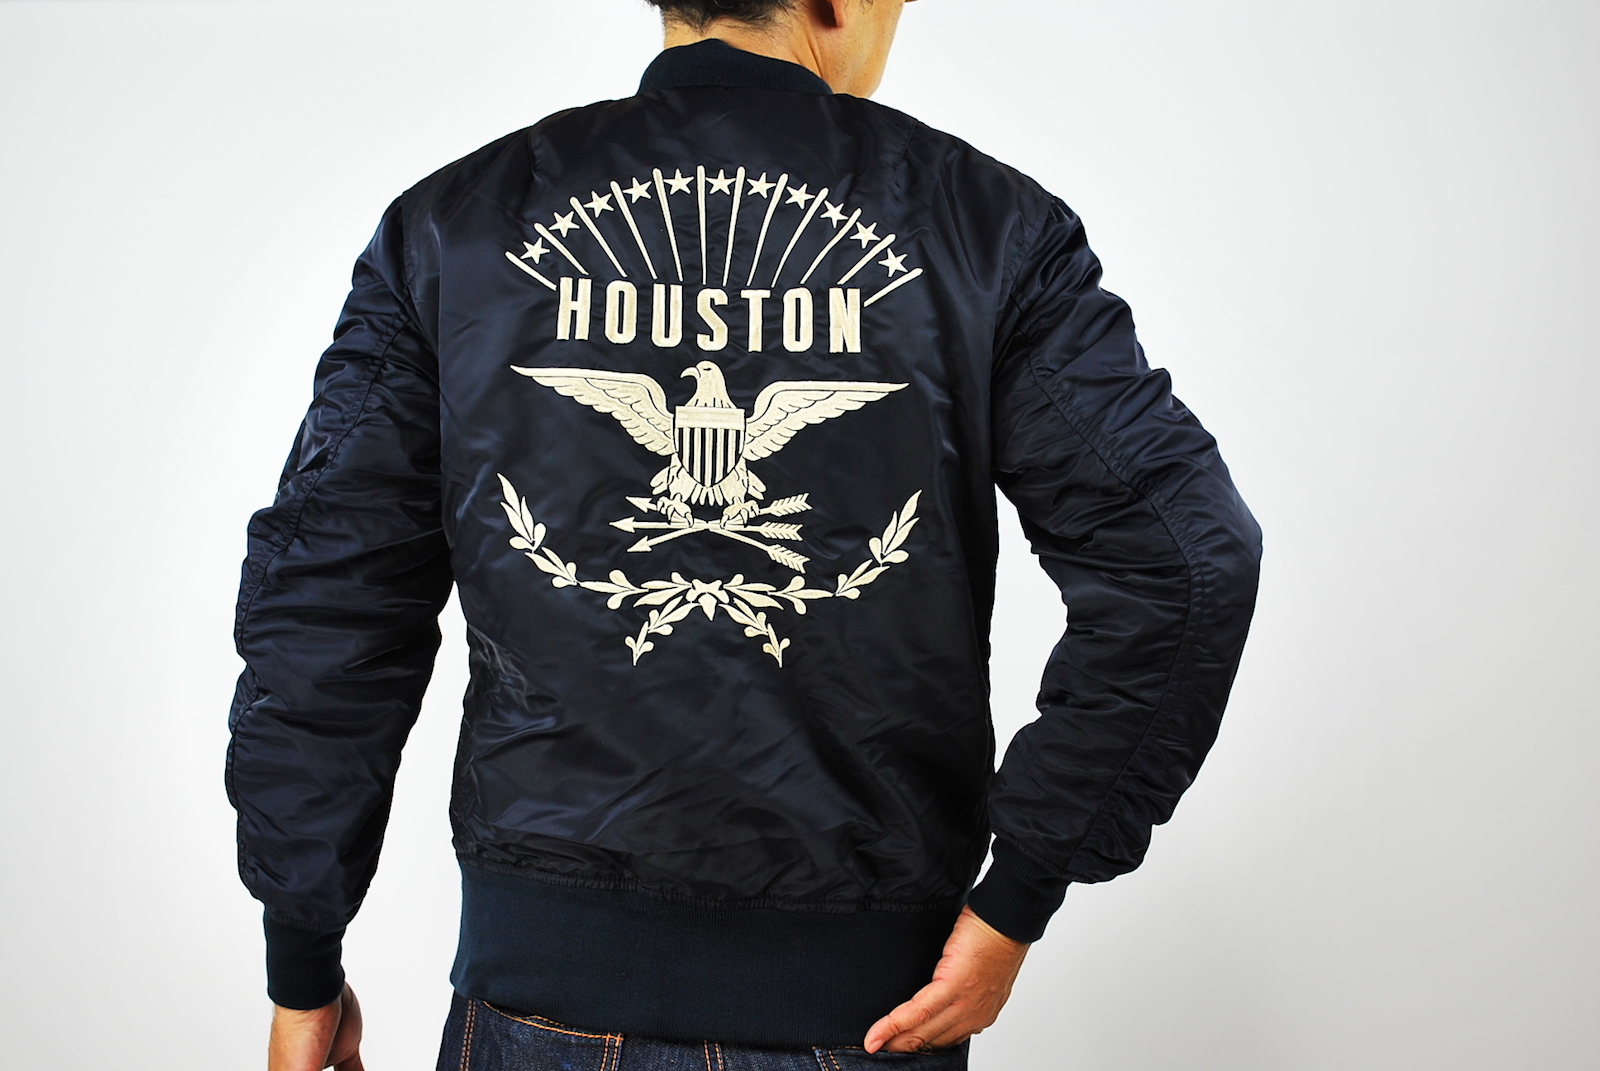 HOUSTON MA 1 刺繍ロゴ FLIGHT JACKET ミリタリー フライトジャケット 50565 NAVY ネイビー L houston ma 1 ミリタリー ジャケット コートvN0wOnm8